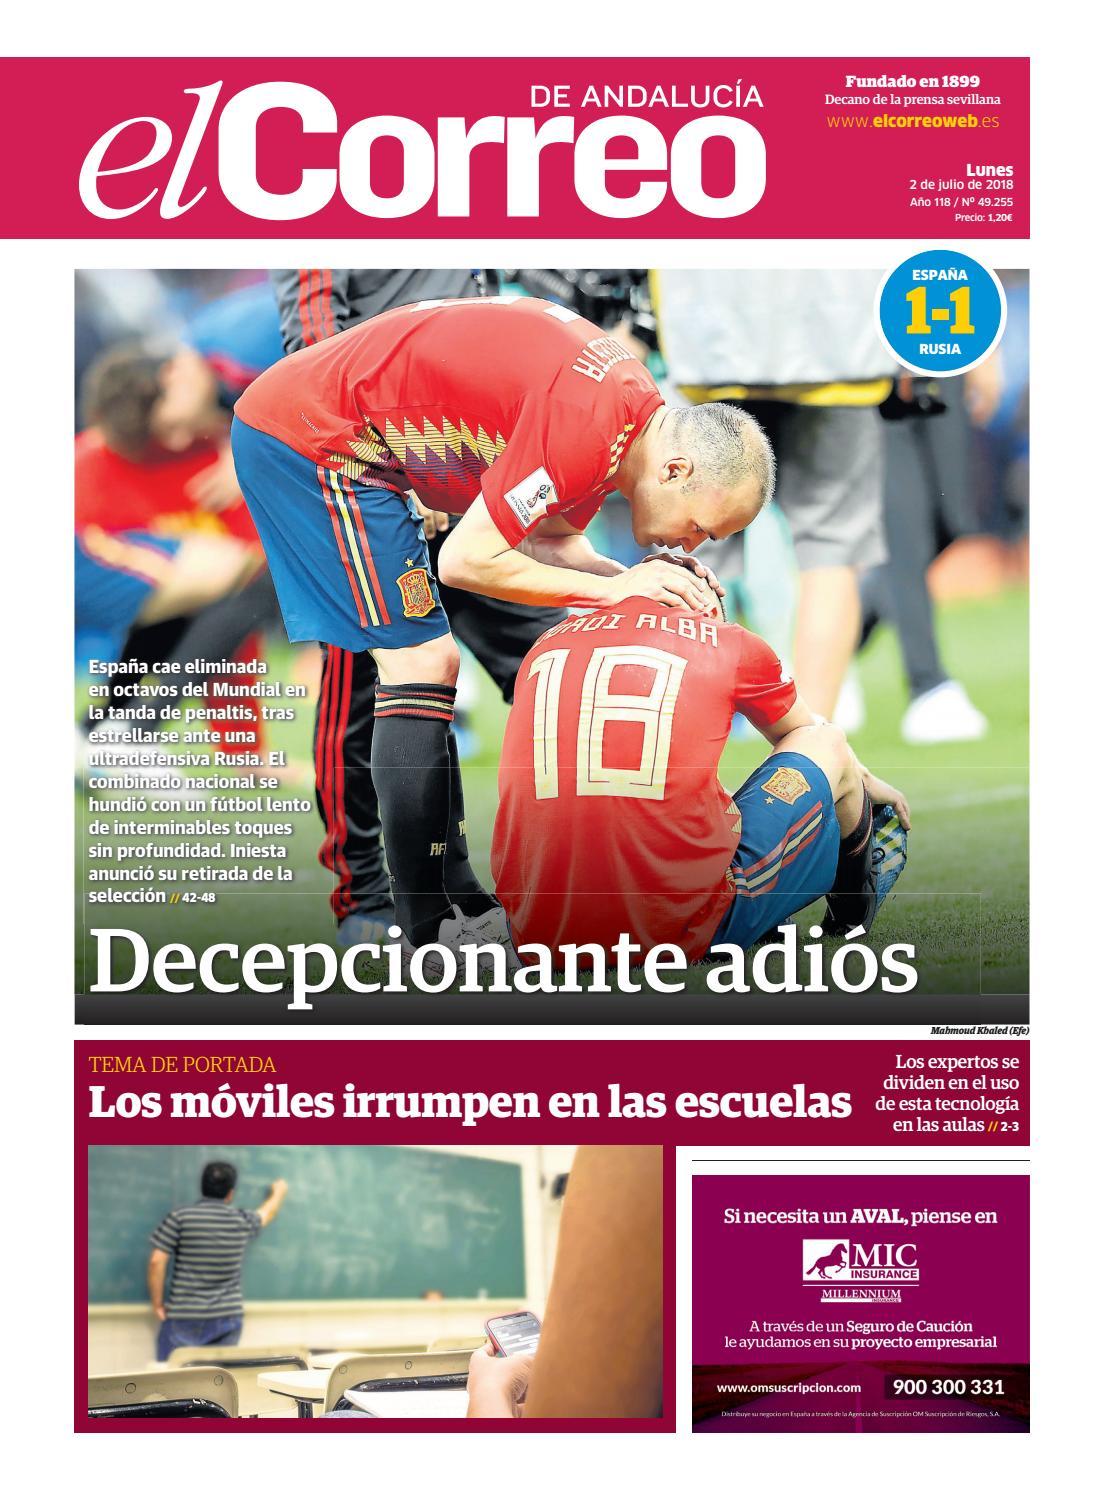 02.07.2018 El Correo de Andalucía by EL CORREO DE ANDALUCÍA S.L. - issuu 170ac0a01a3